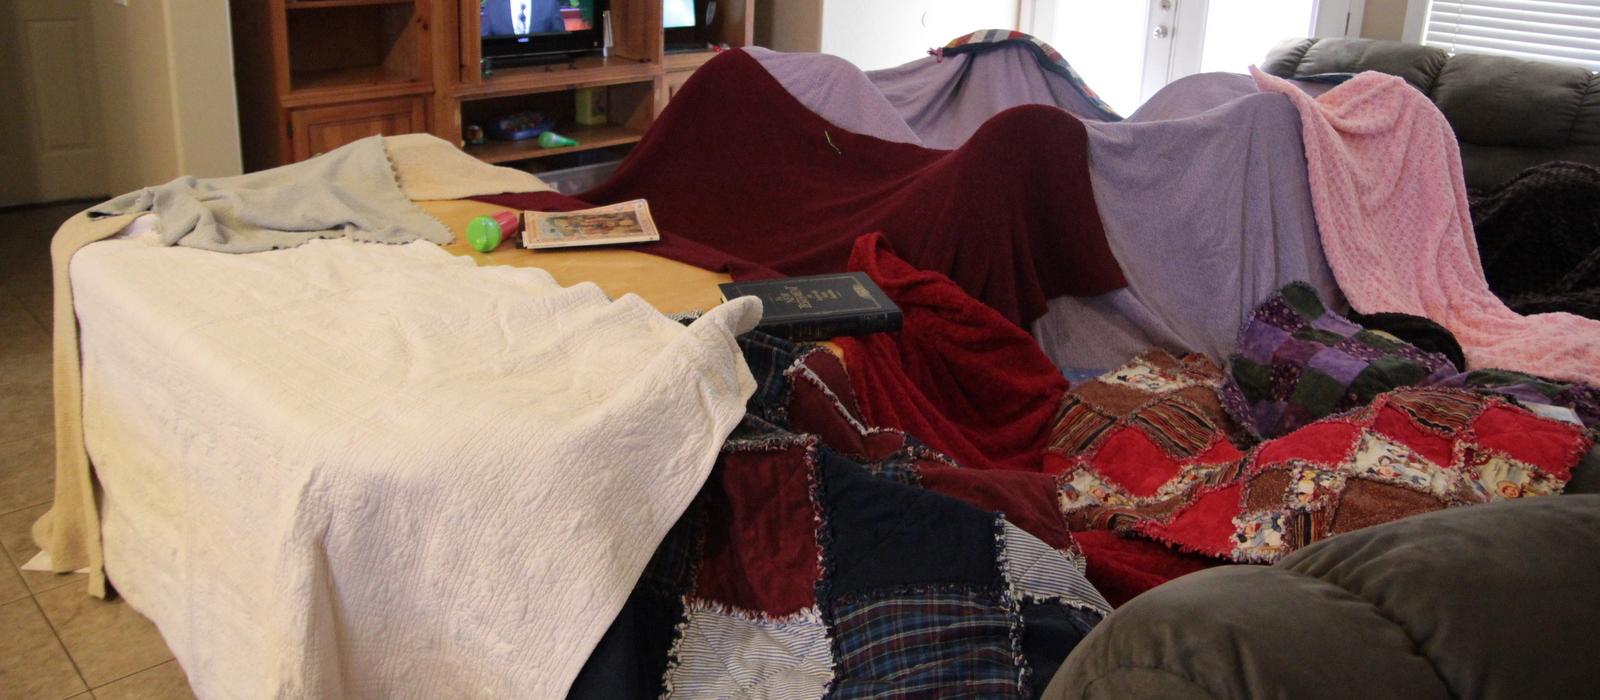 Blanket Fort Tips and Tricks